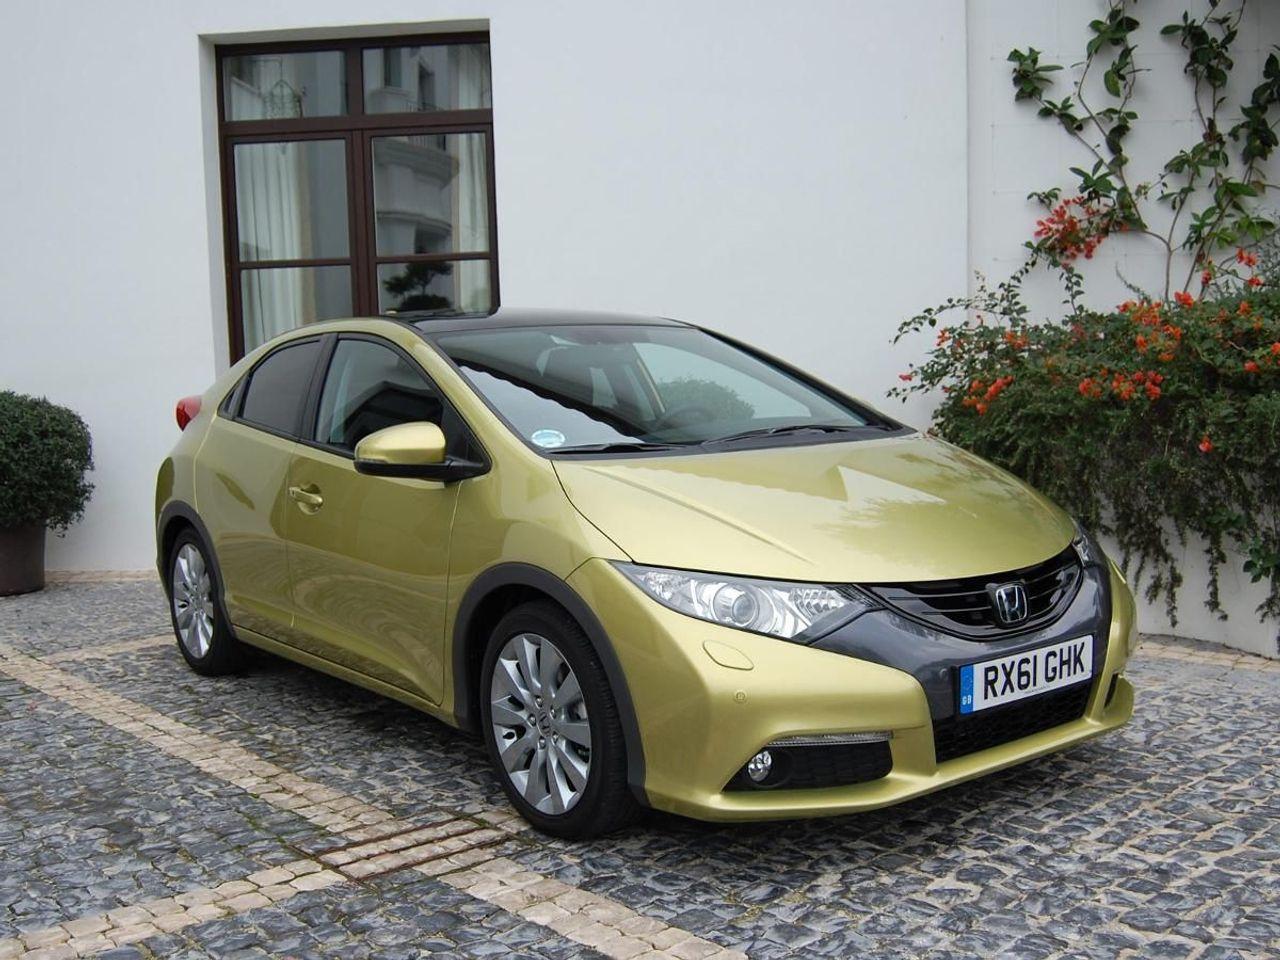 Honda Civic Hatchback (2011 - 2014) MK 9 review | Auto ...